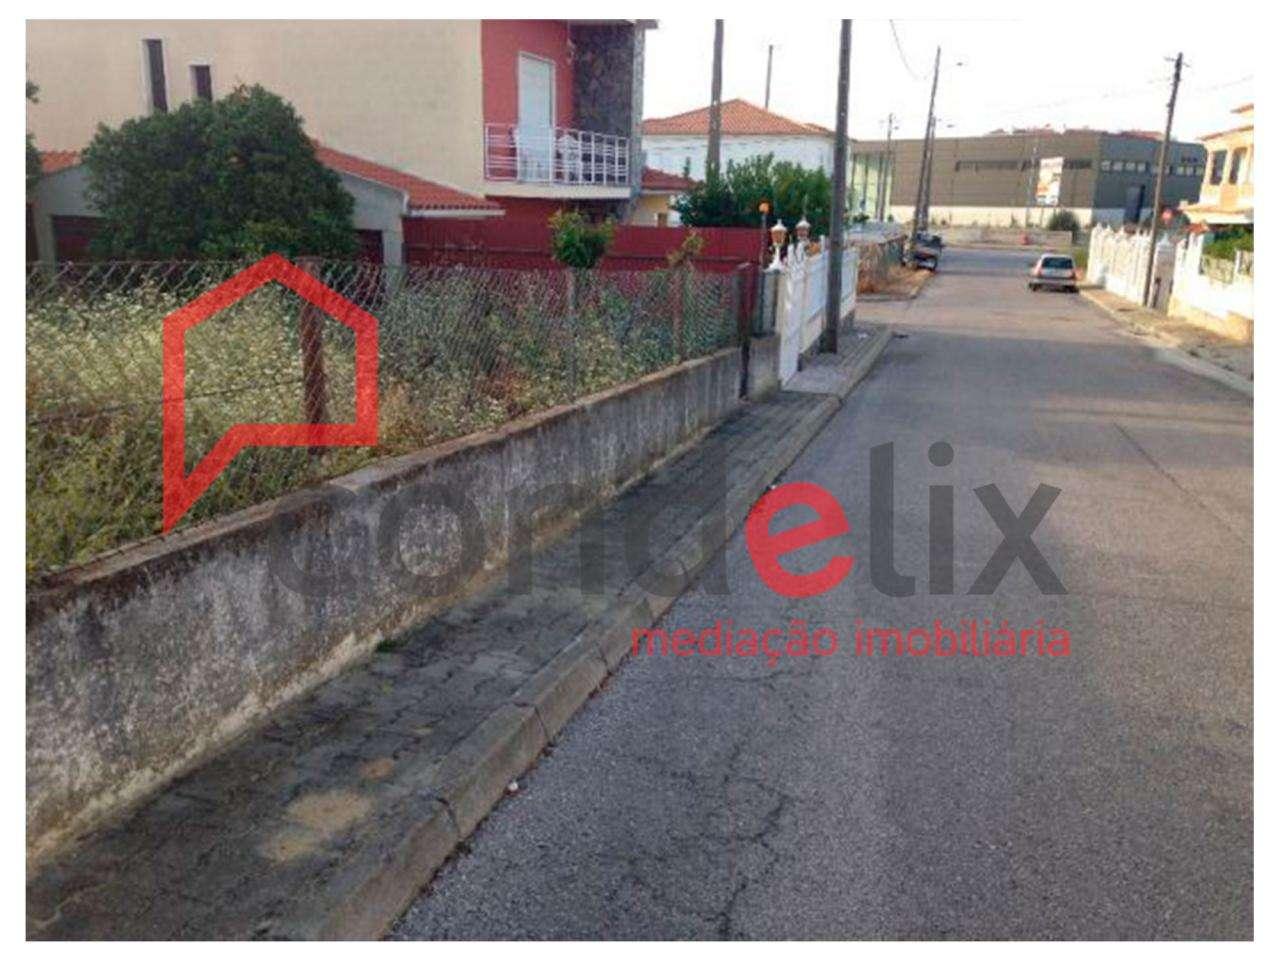 Terreno para comprar, Seixal, Arrentela e Aldeia de Paio Pires, Setúbal - Foto 2